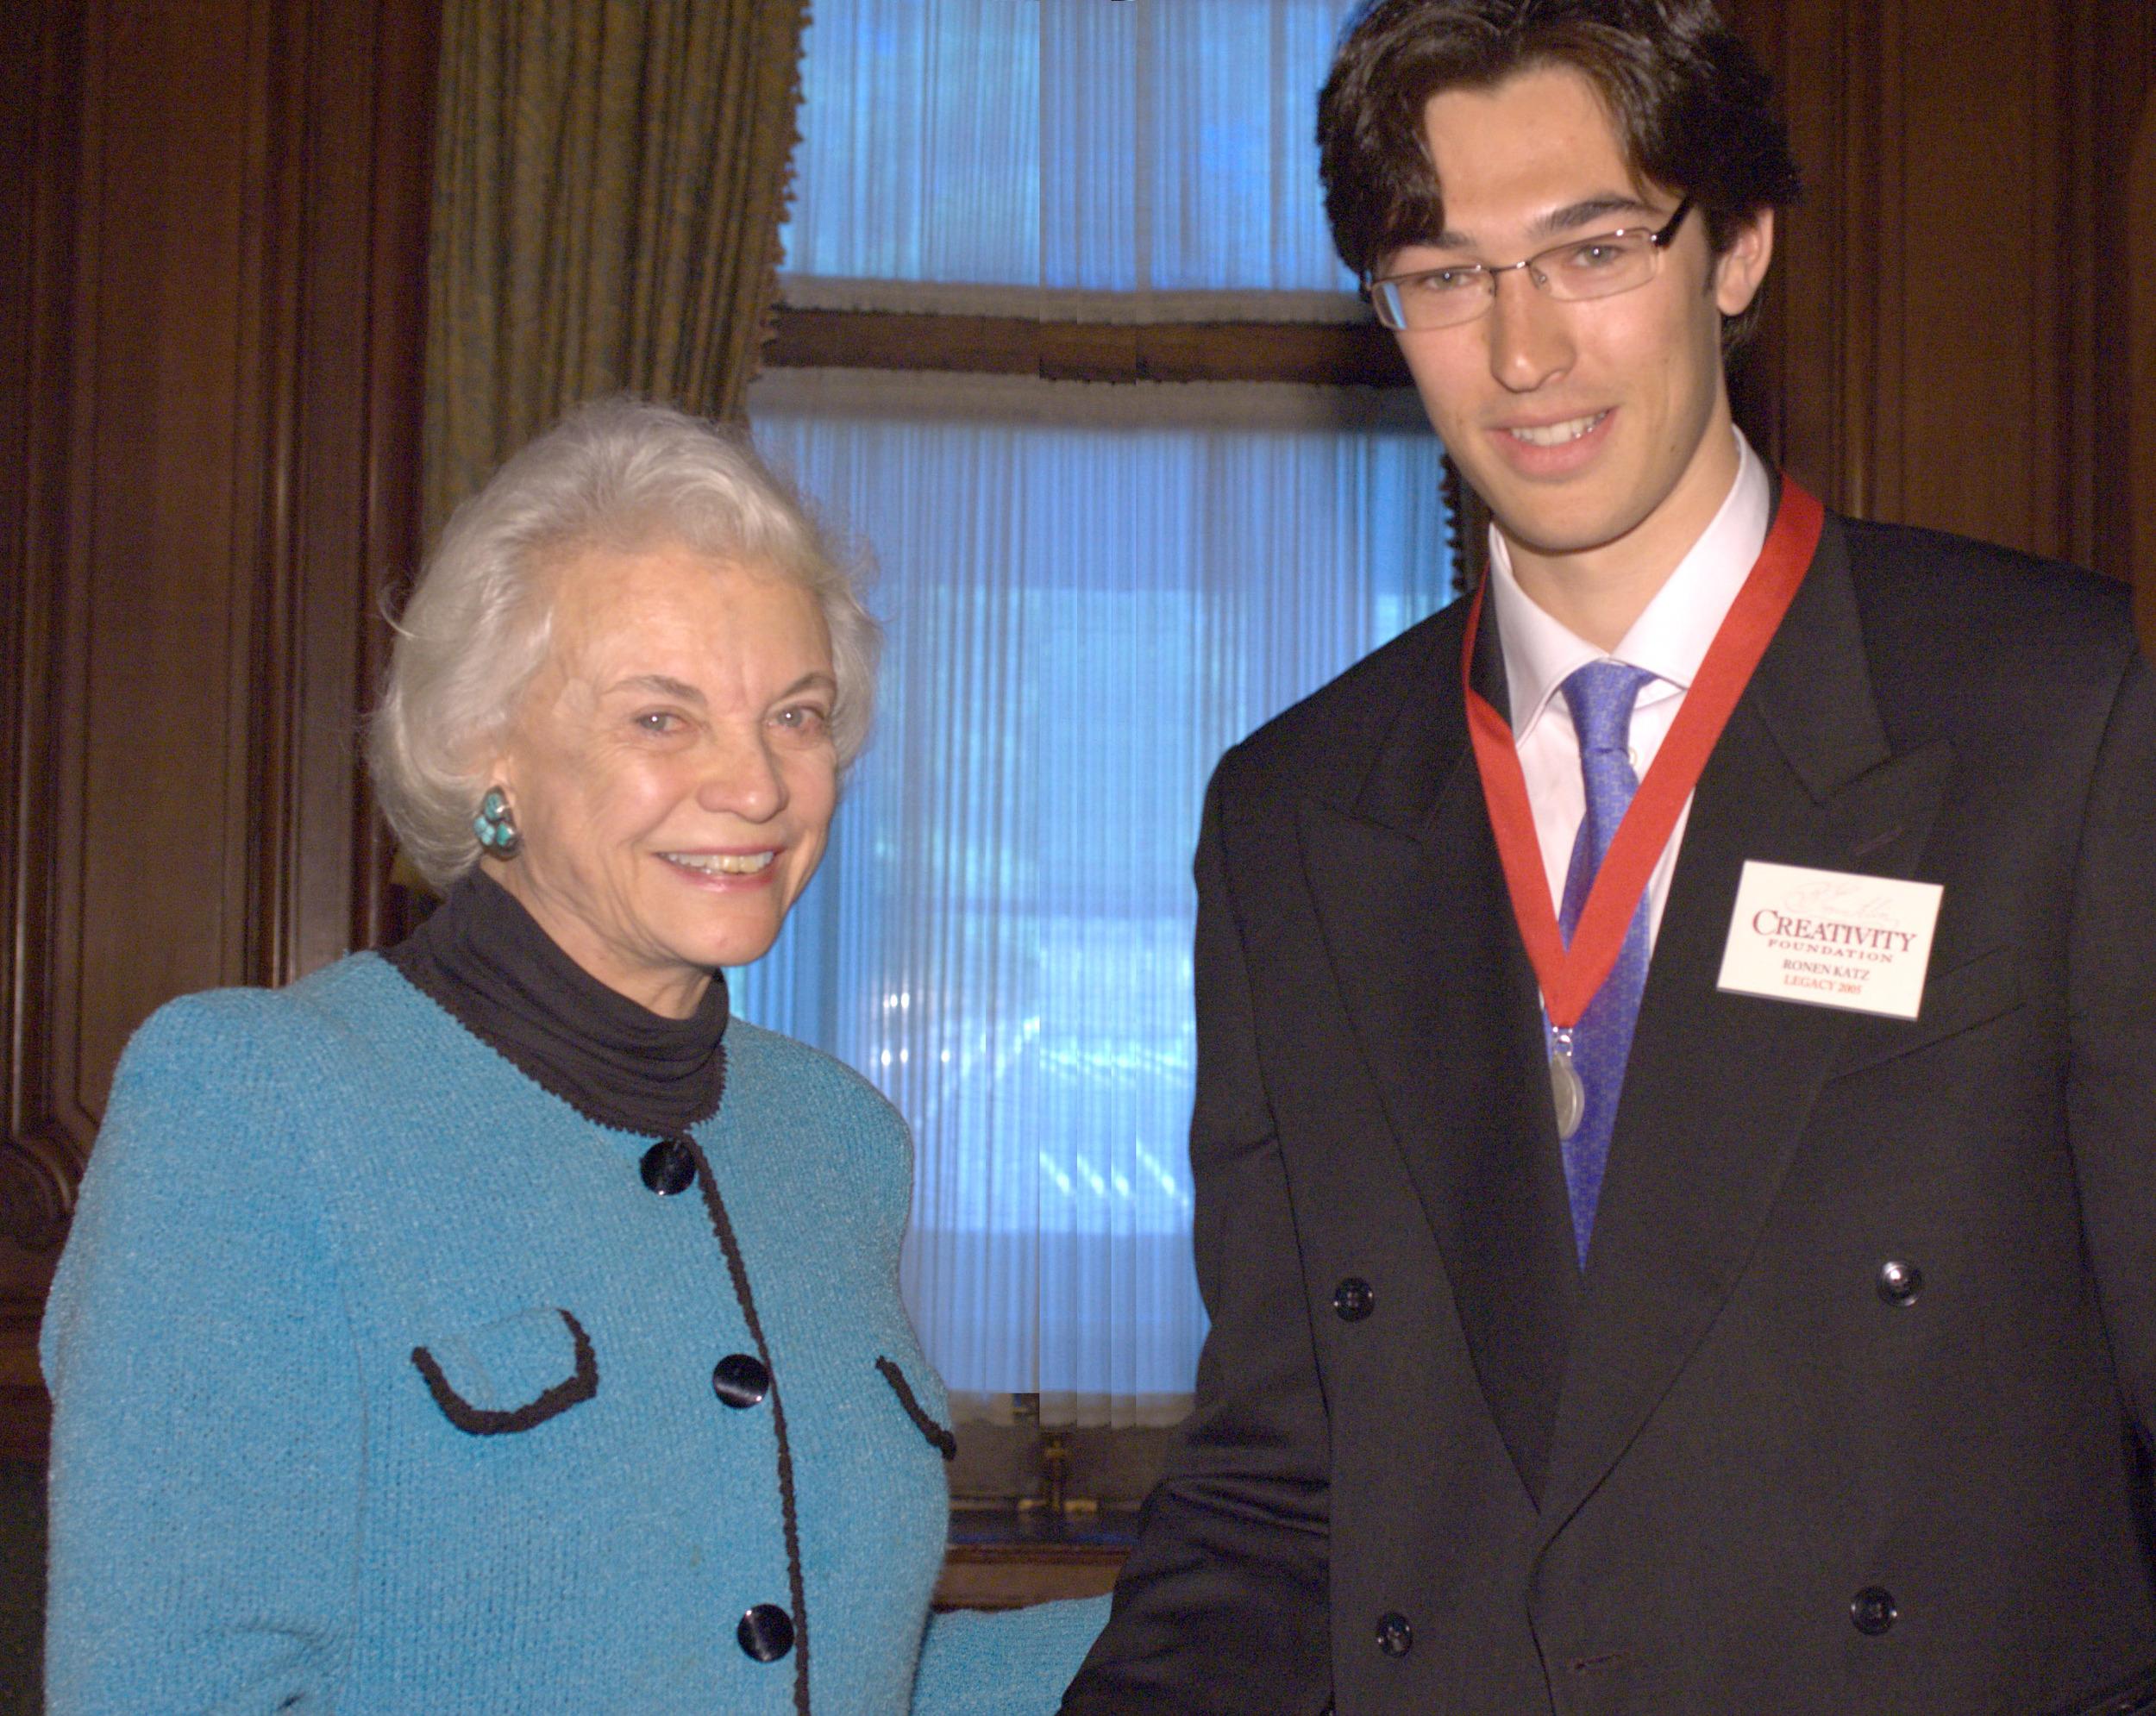 Ronen with 2005 Creativity Laureate Sandra Day O'Connor